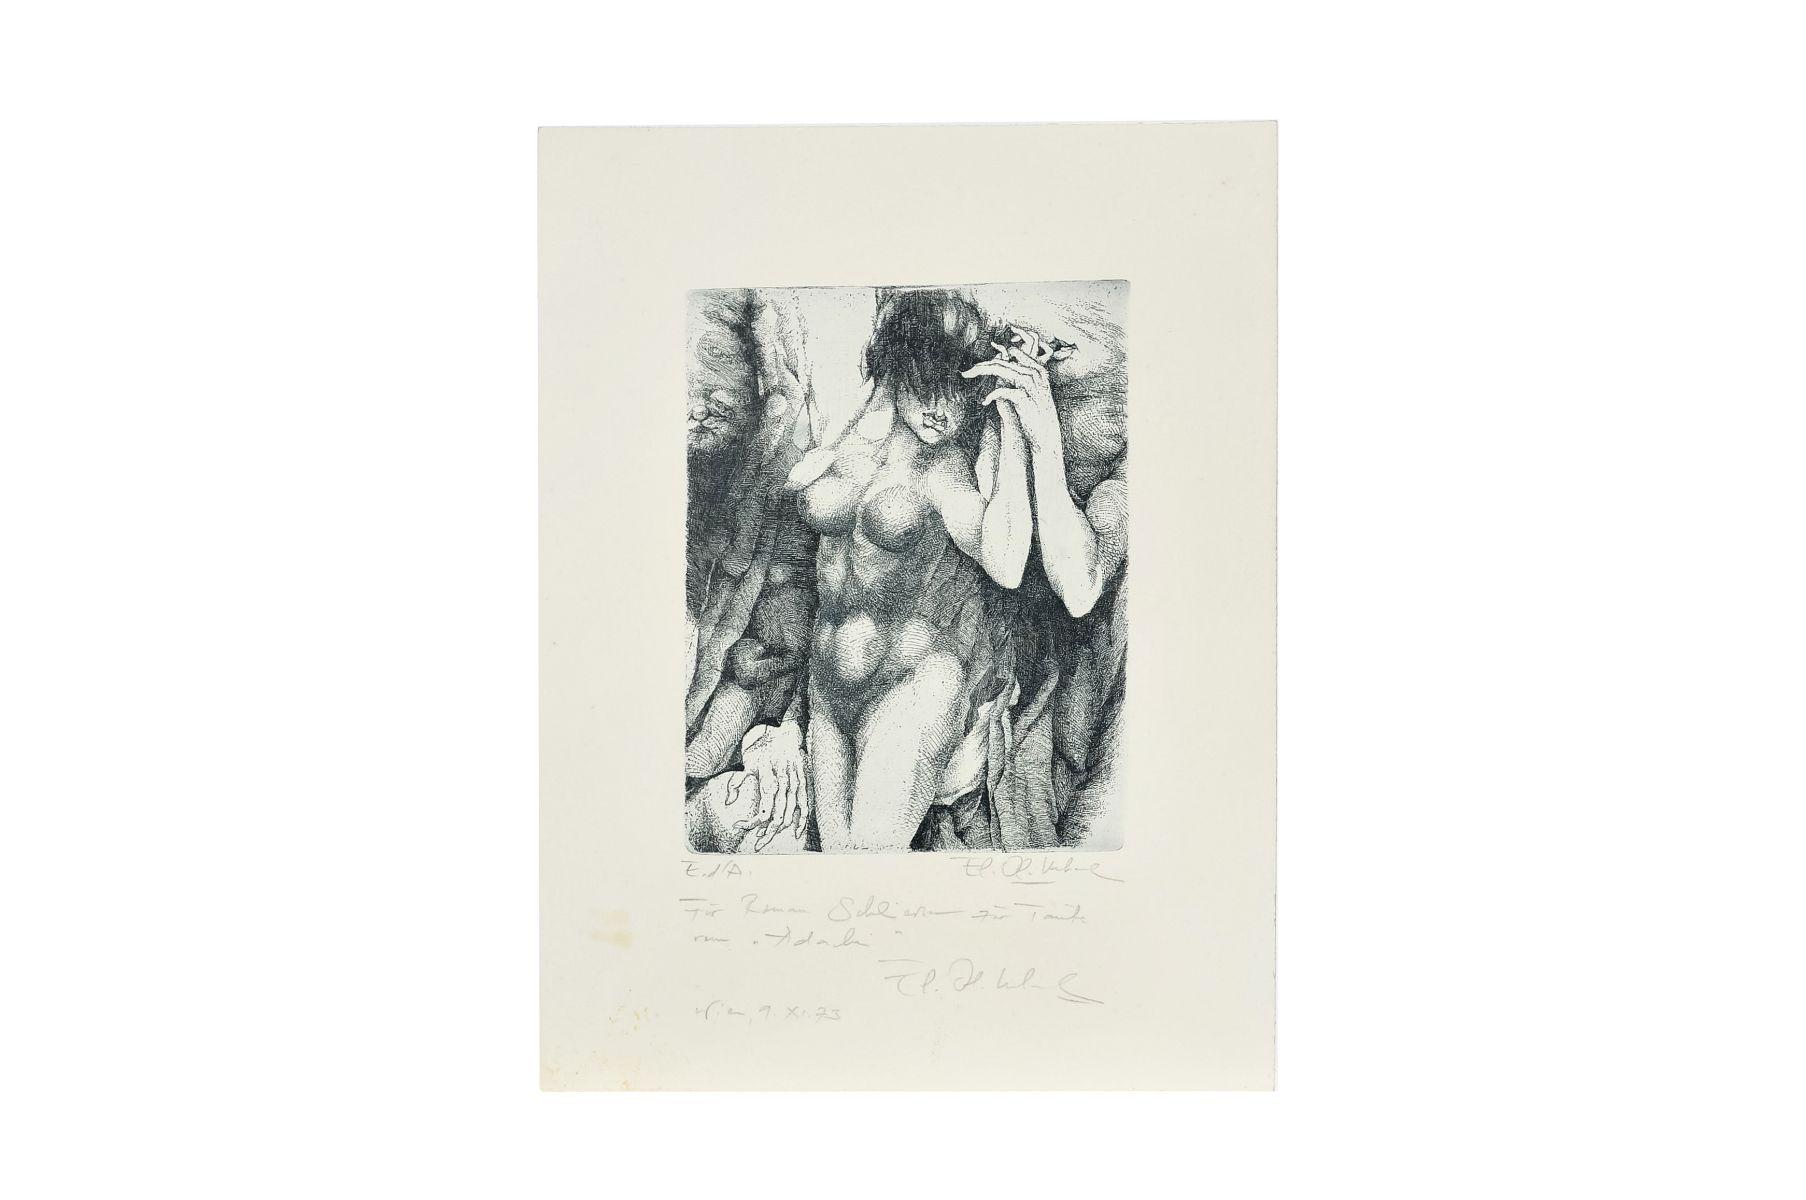 "#6 Leherb, also Maître Leherb (1933 - 1997) , ""Women nude"" | Leherb, auch Maître Leherb (1933 - 1997)  ""Frauen Akt"" Image"